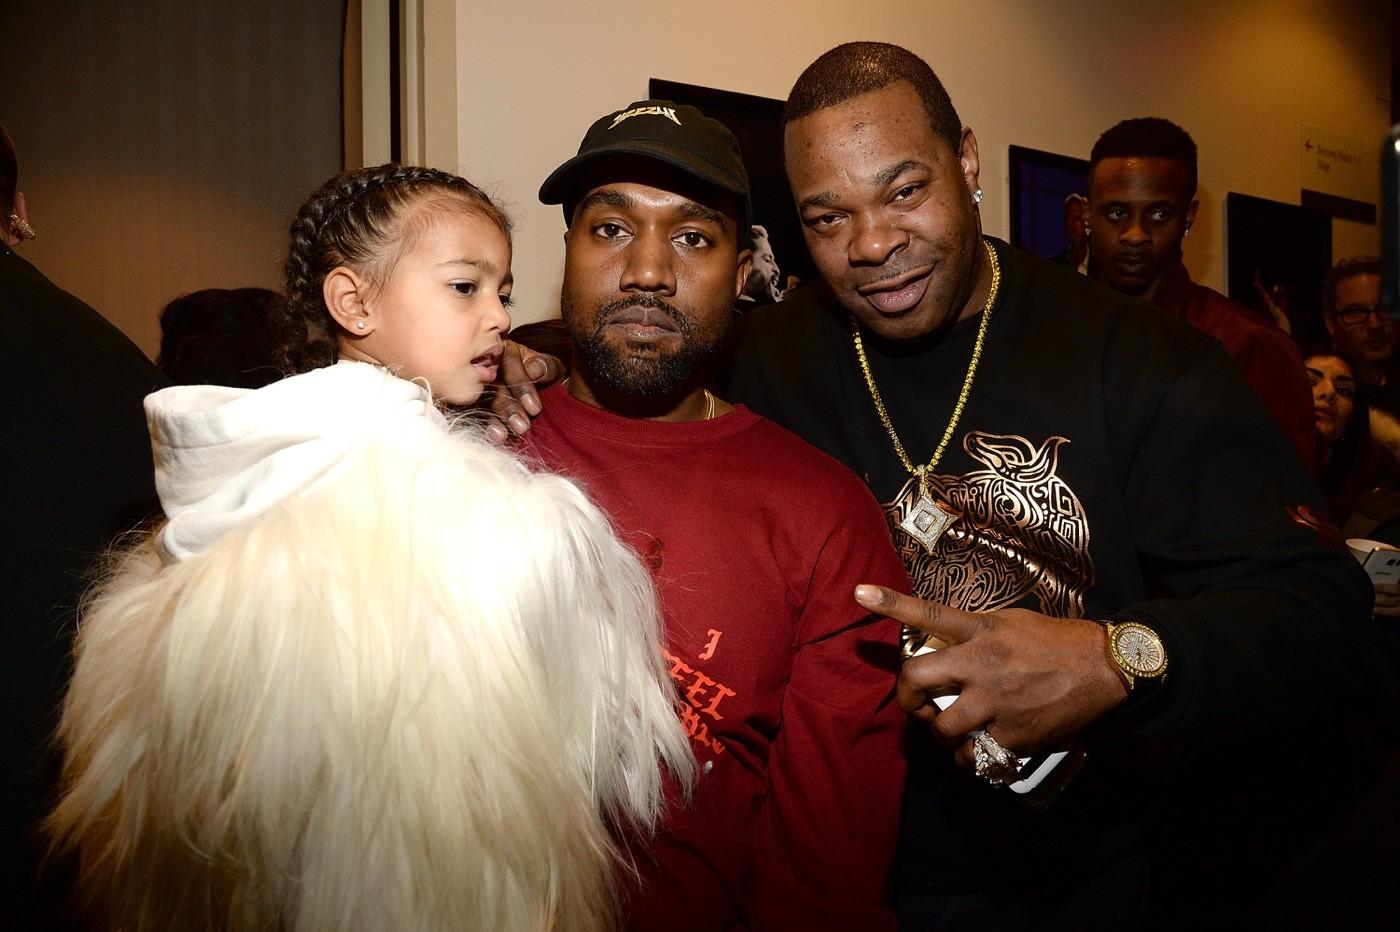 The demanding Kanye West